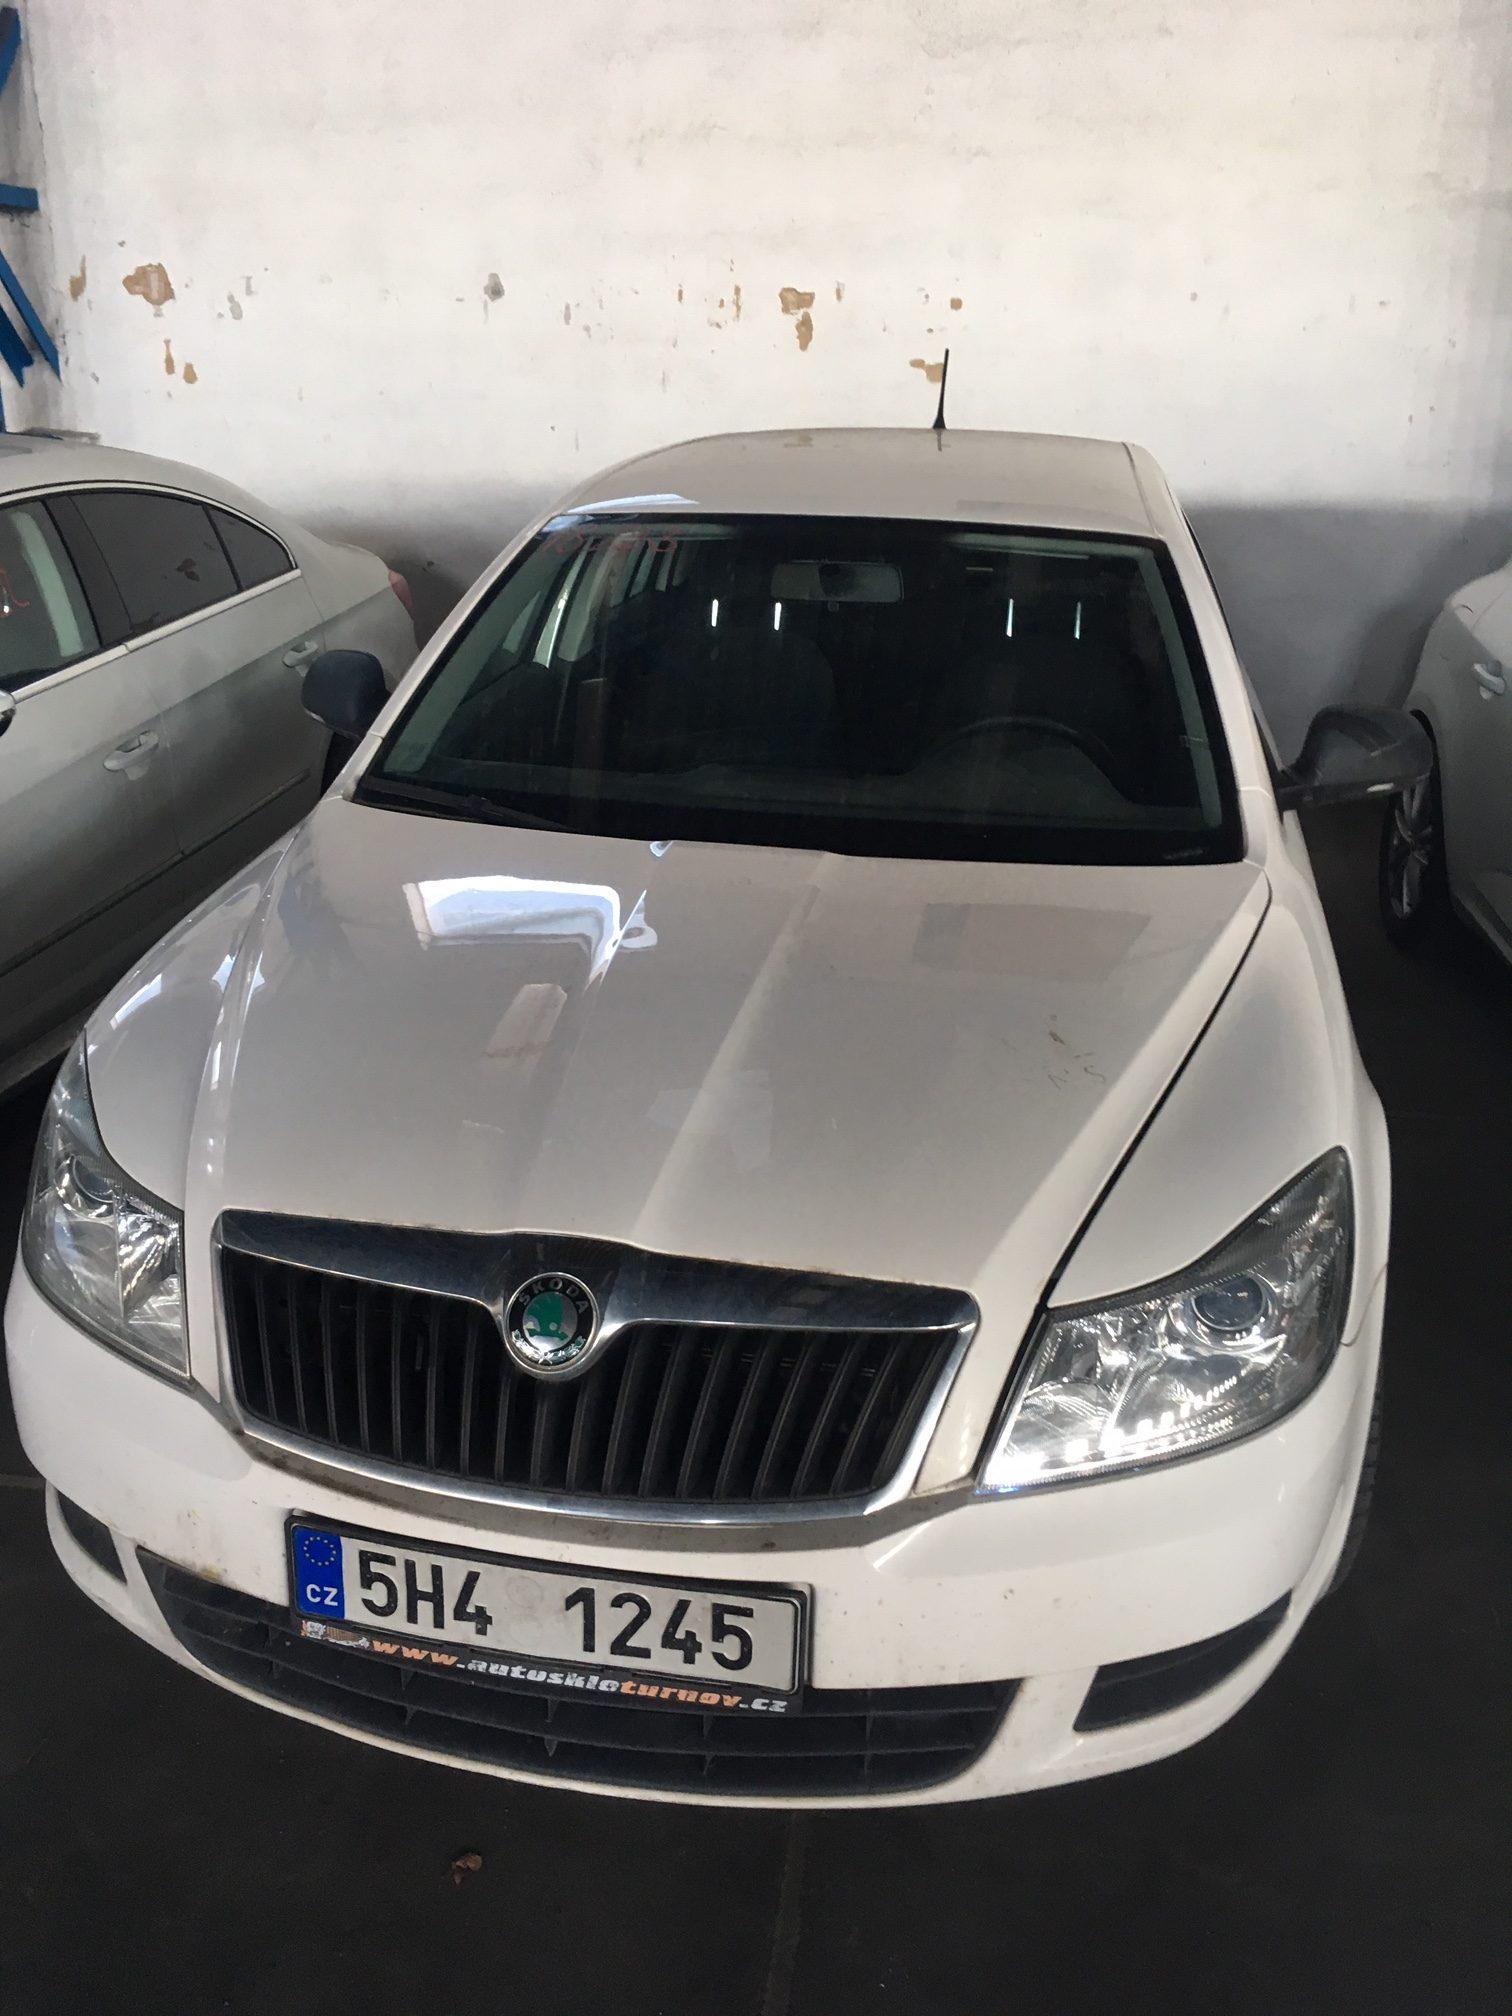 Aukce Škoda Octavia 1Z vydraženo 99 000